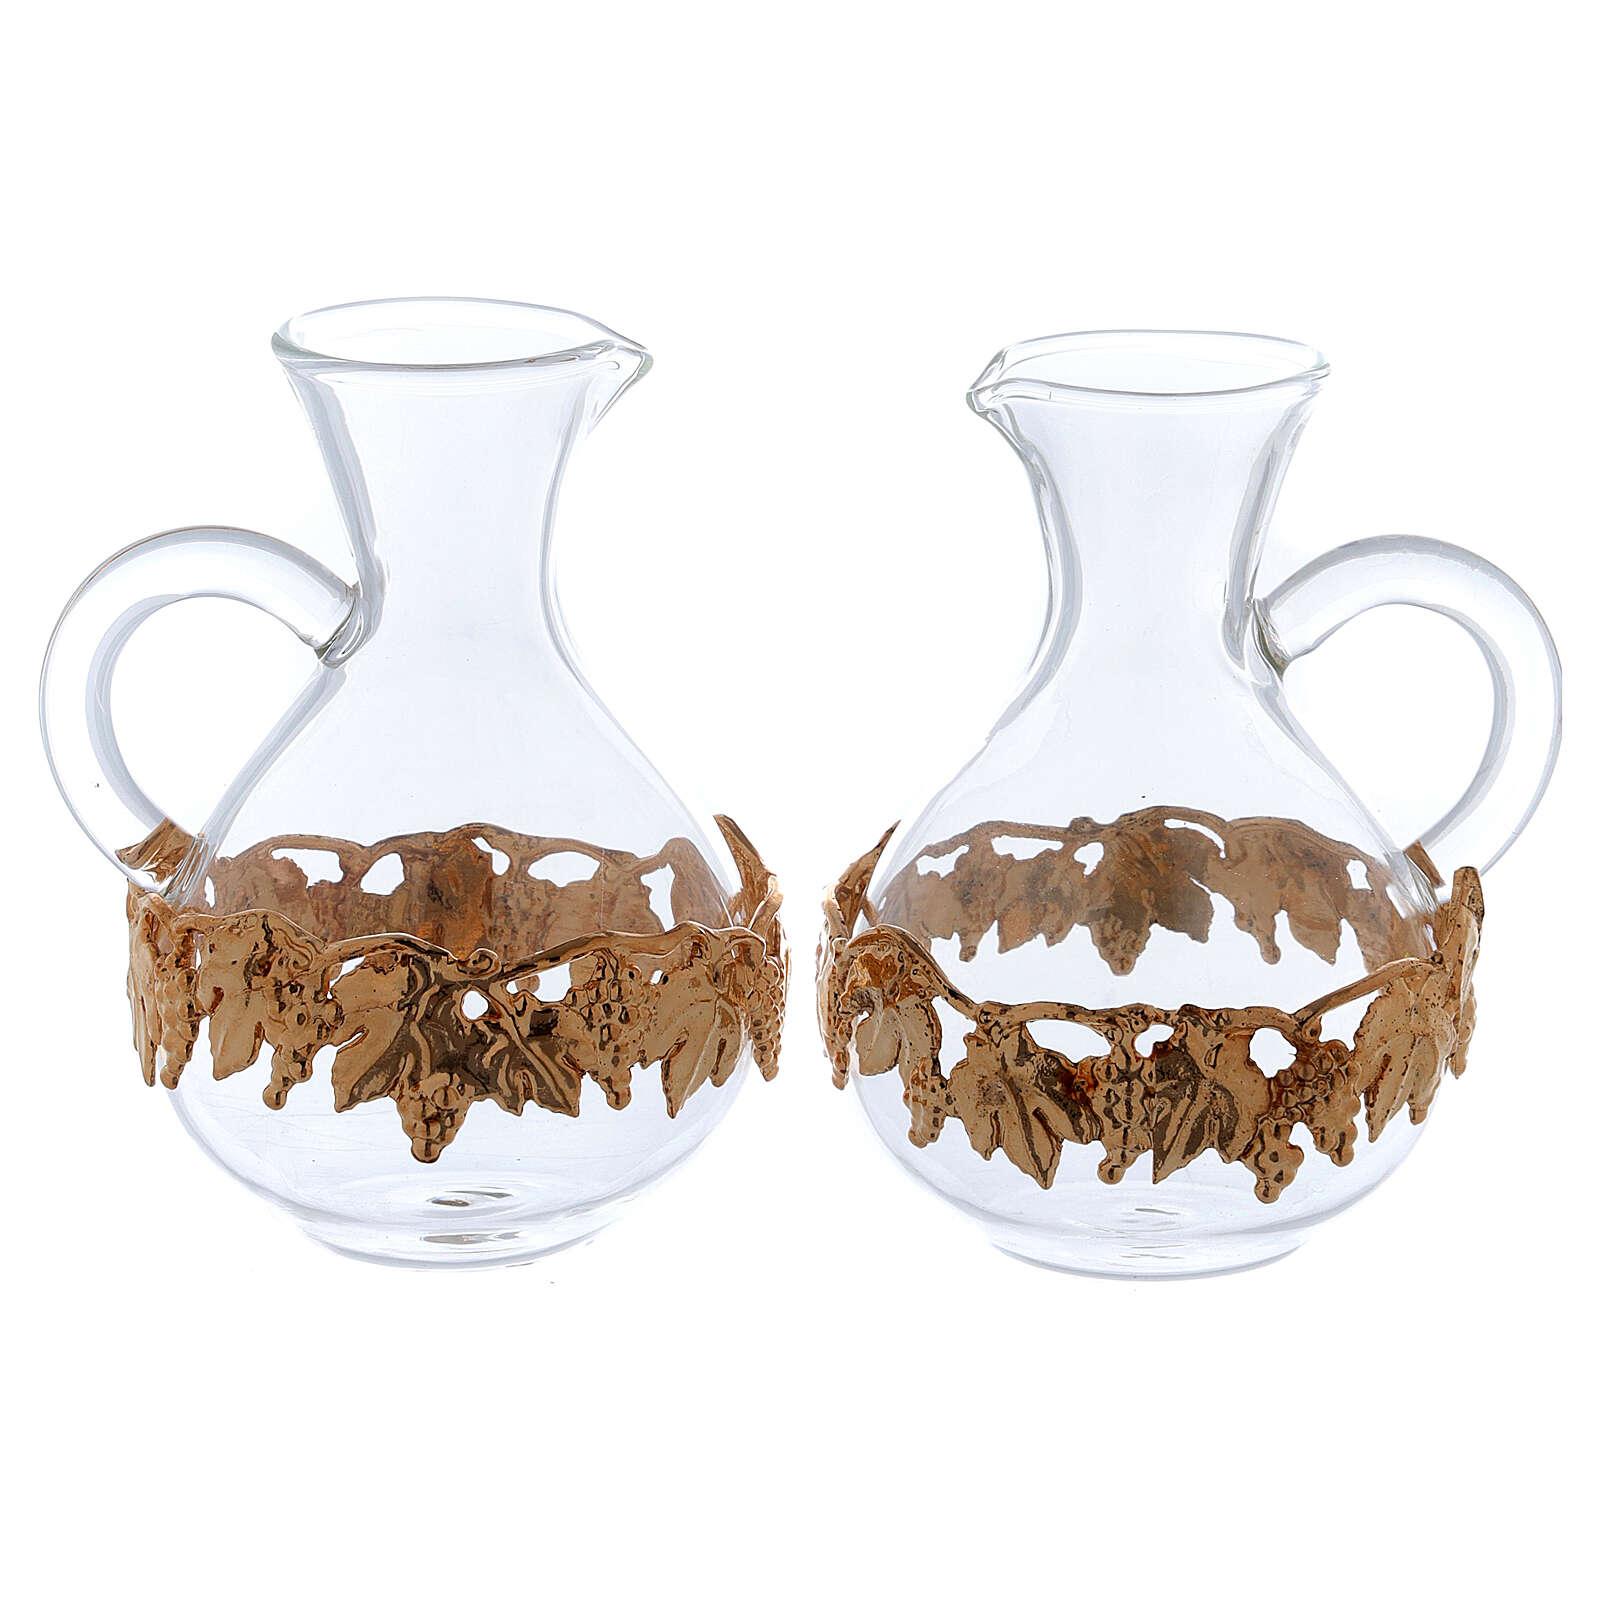 Ewer in glass and golden zamak 140 ml, 2 pcs 4